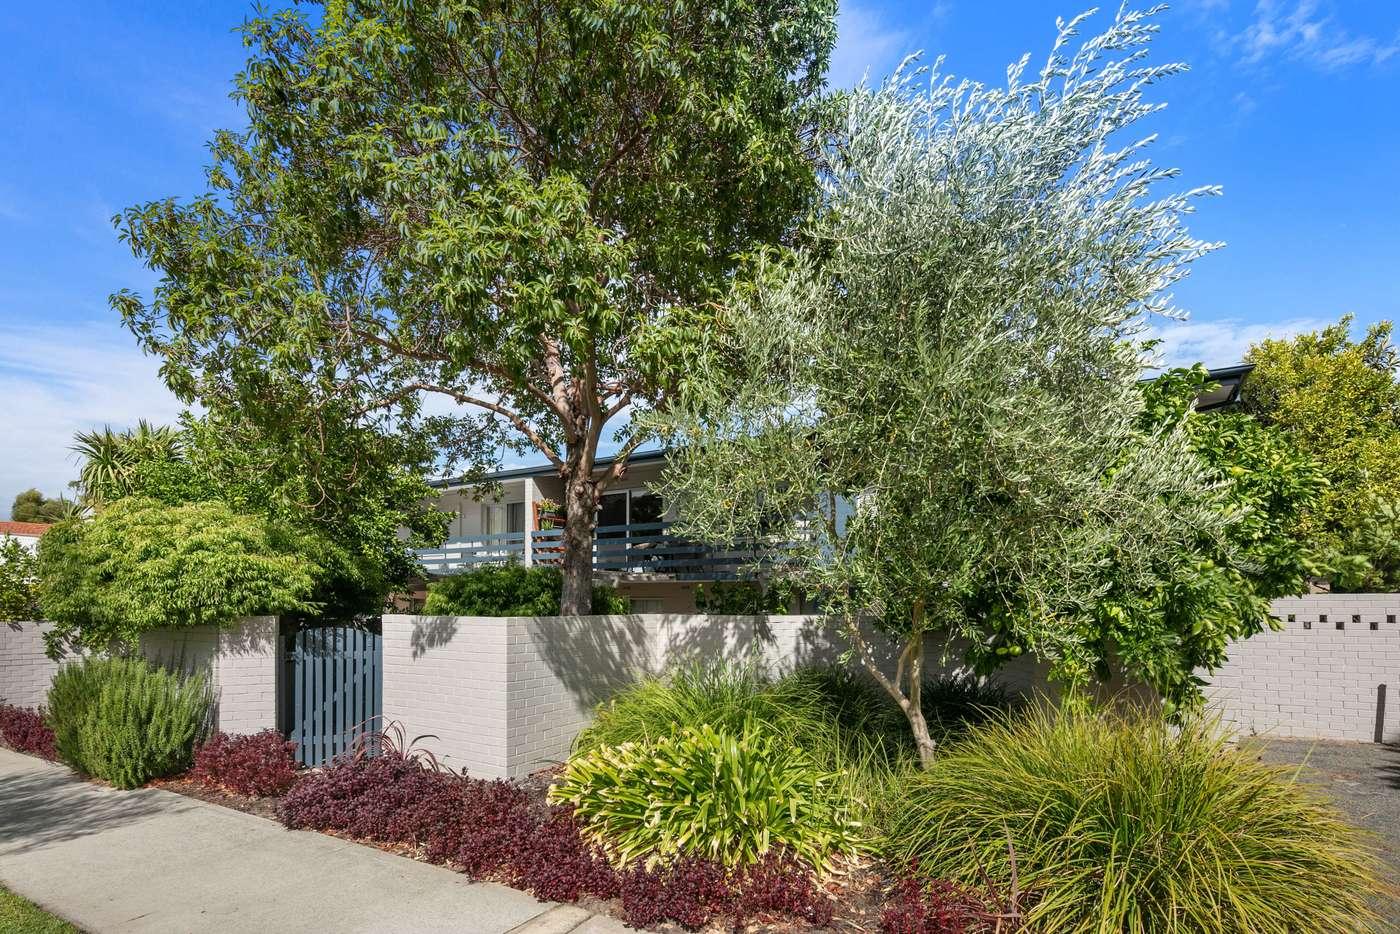 Main view of Homely apartment listing, 8/233 Hensman Road, Shenton Park WA 6008